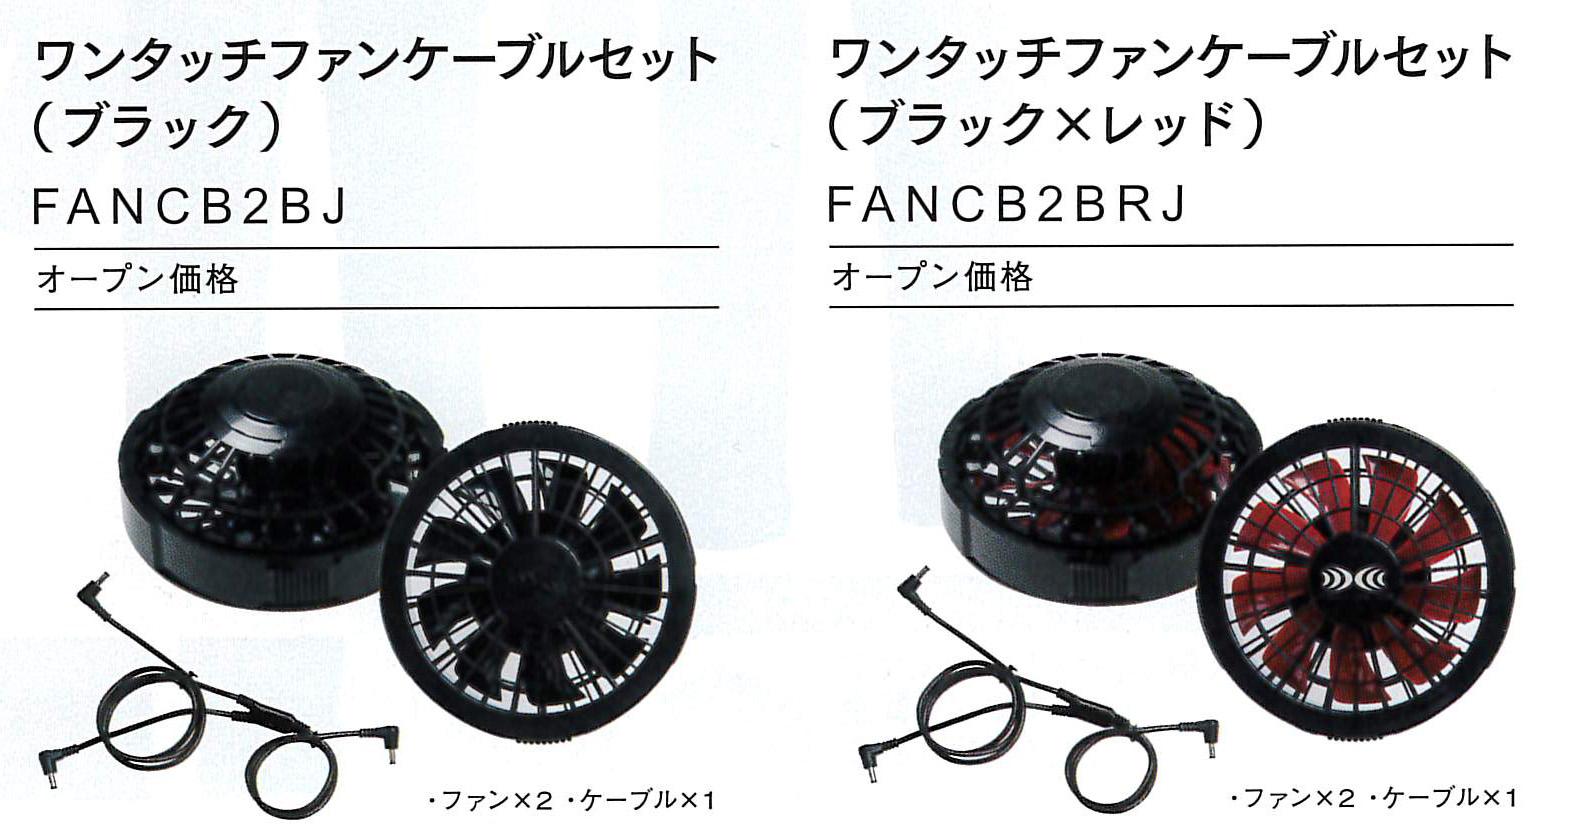 FANCB2BJ/RJ ワンタッチファンケーブルセット¥4,950(税込)